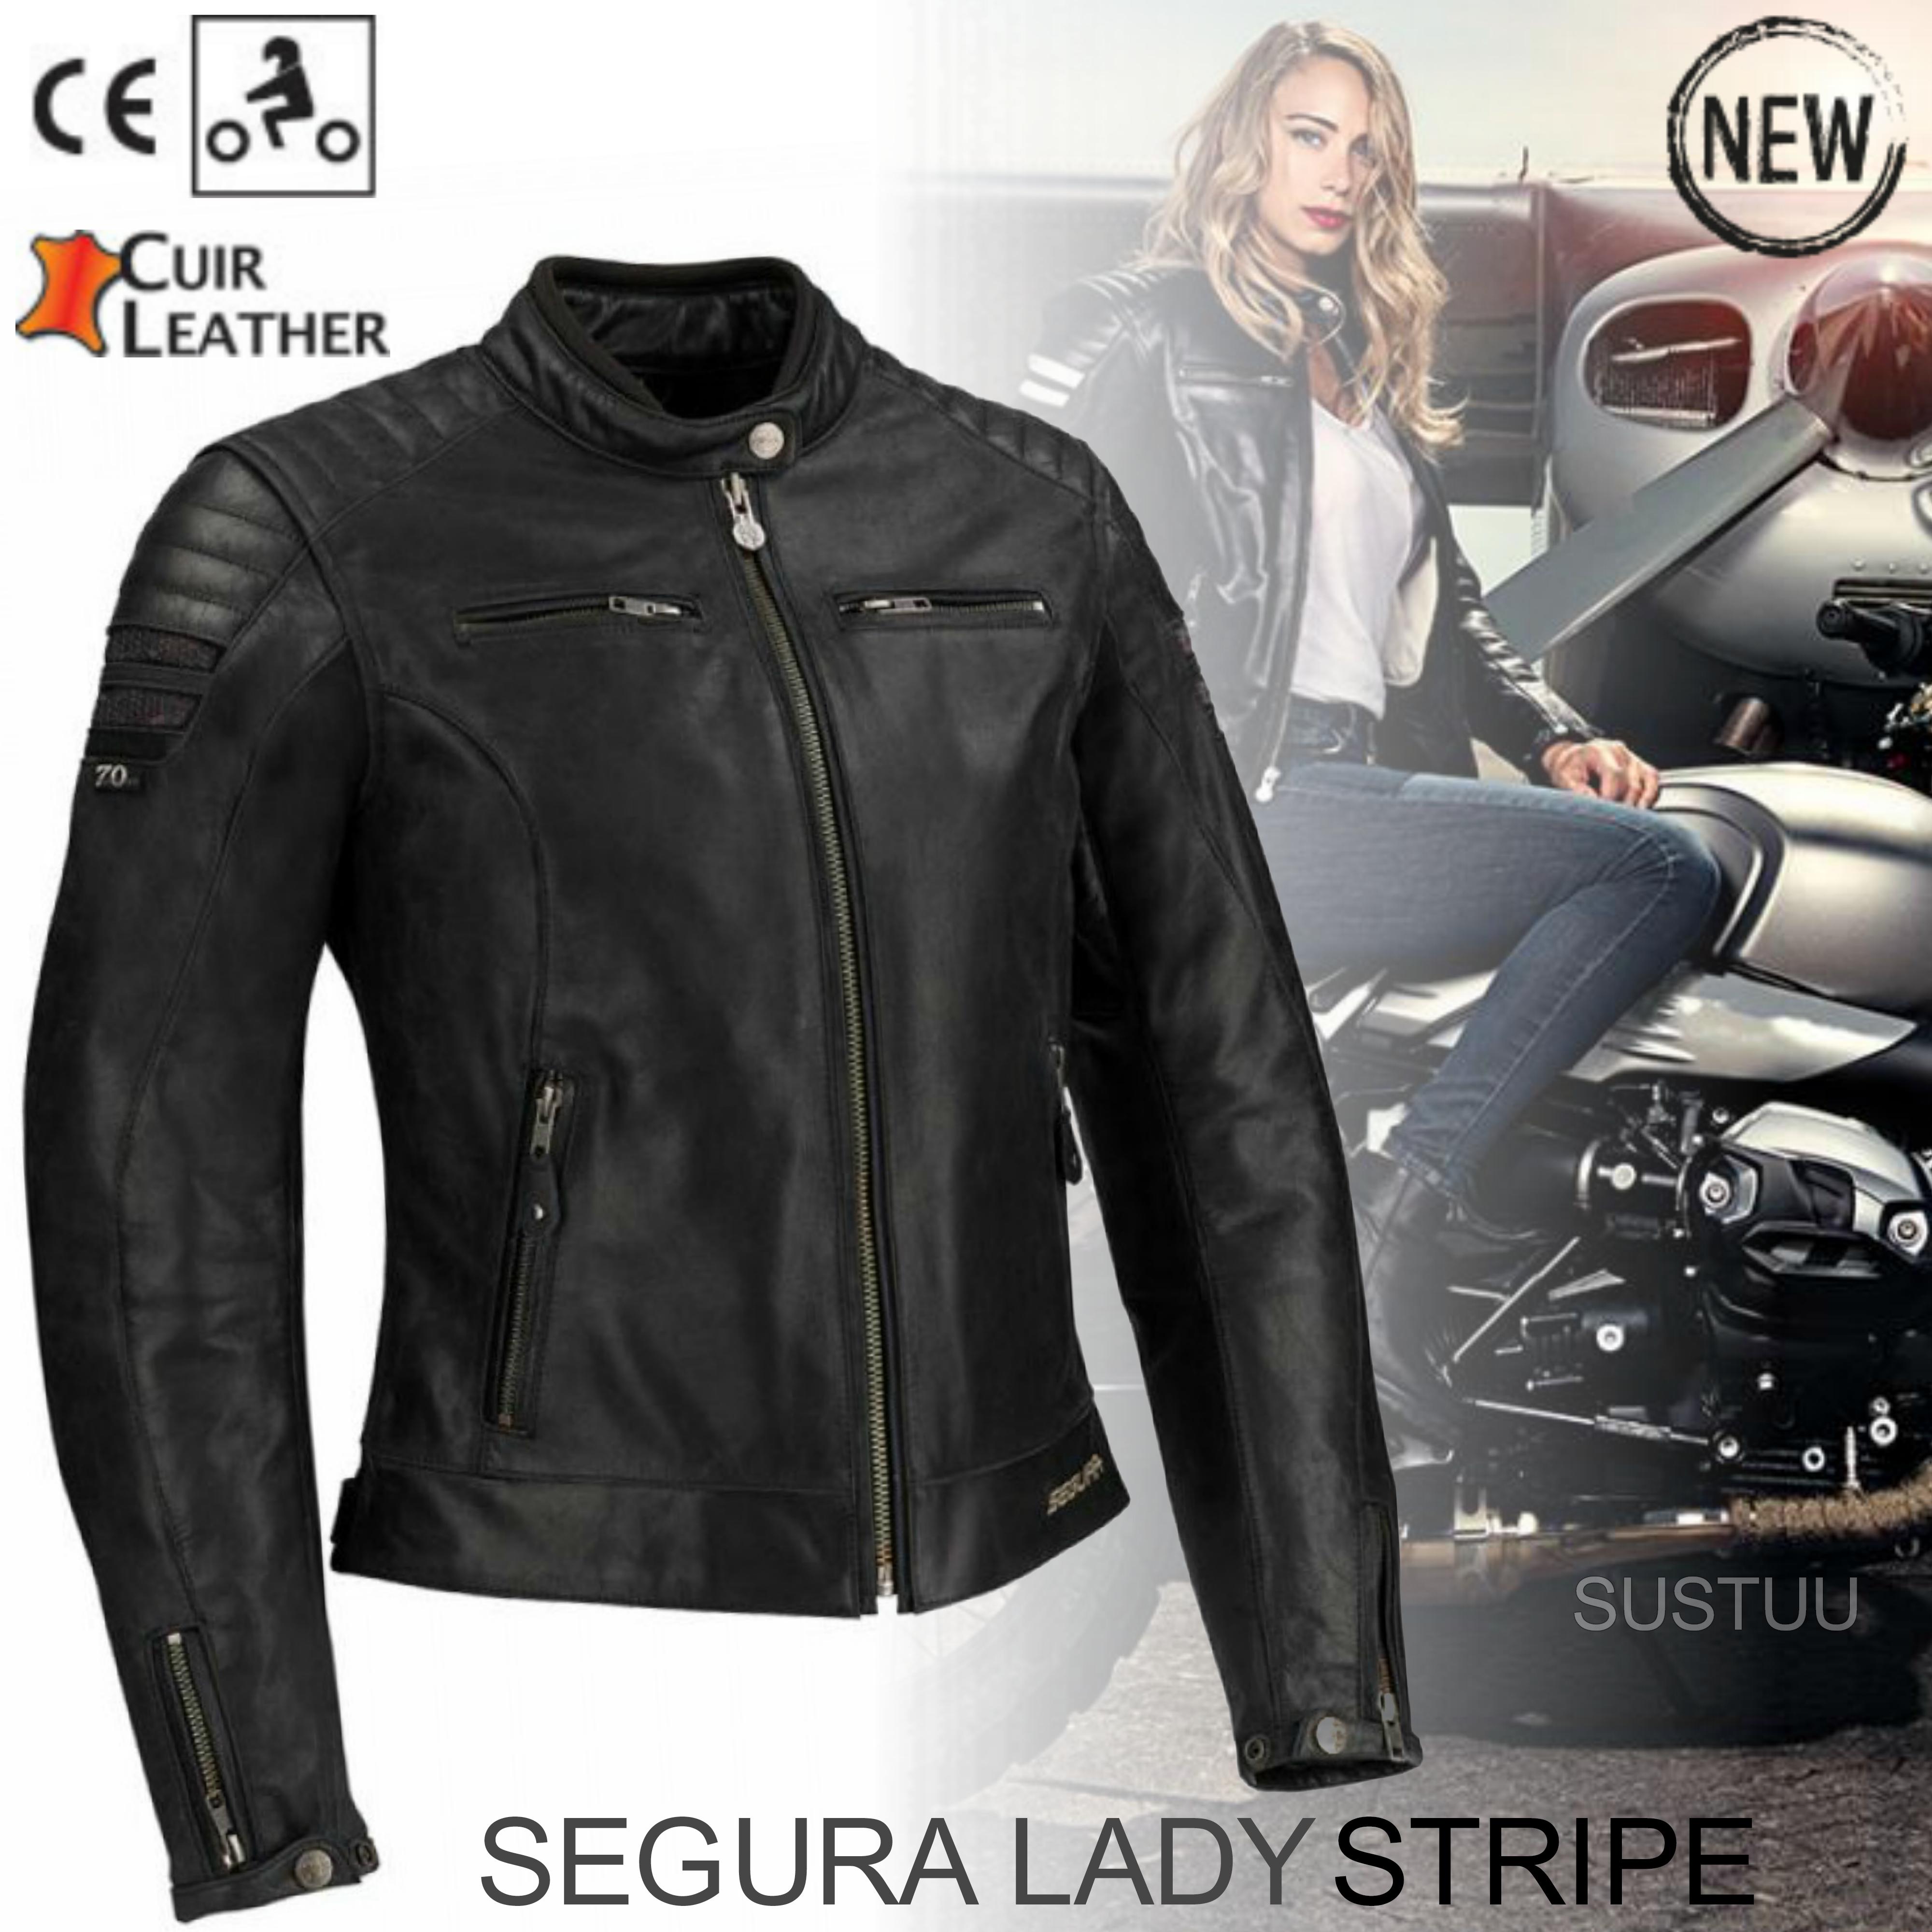 New Segura Lady Stripe Motorcycle/Bike Female Jacket|Buffalo Leather|Body-Fit|CE Protector|Black